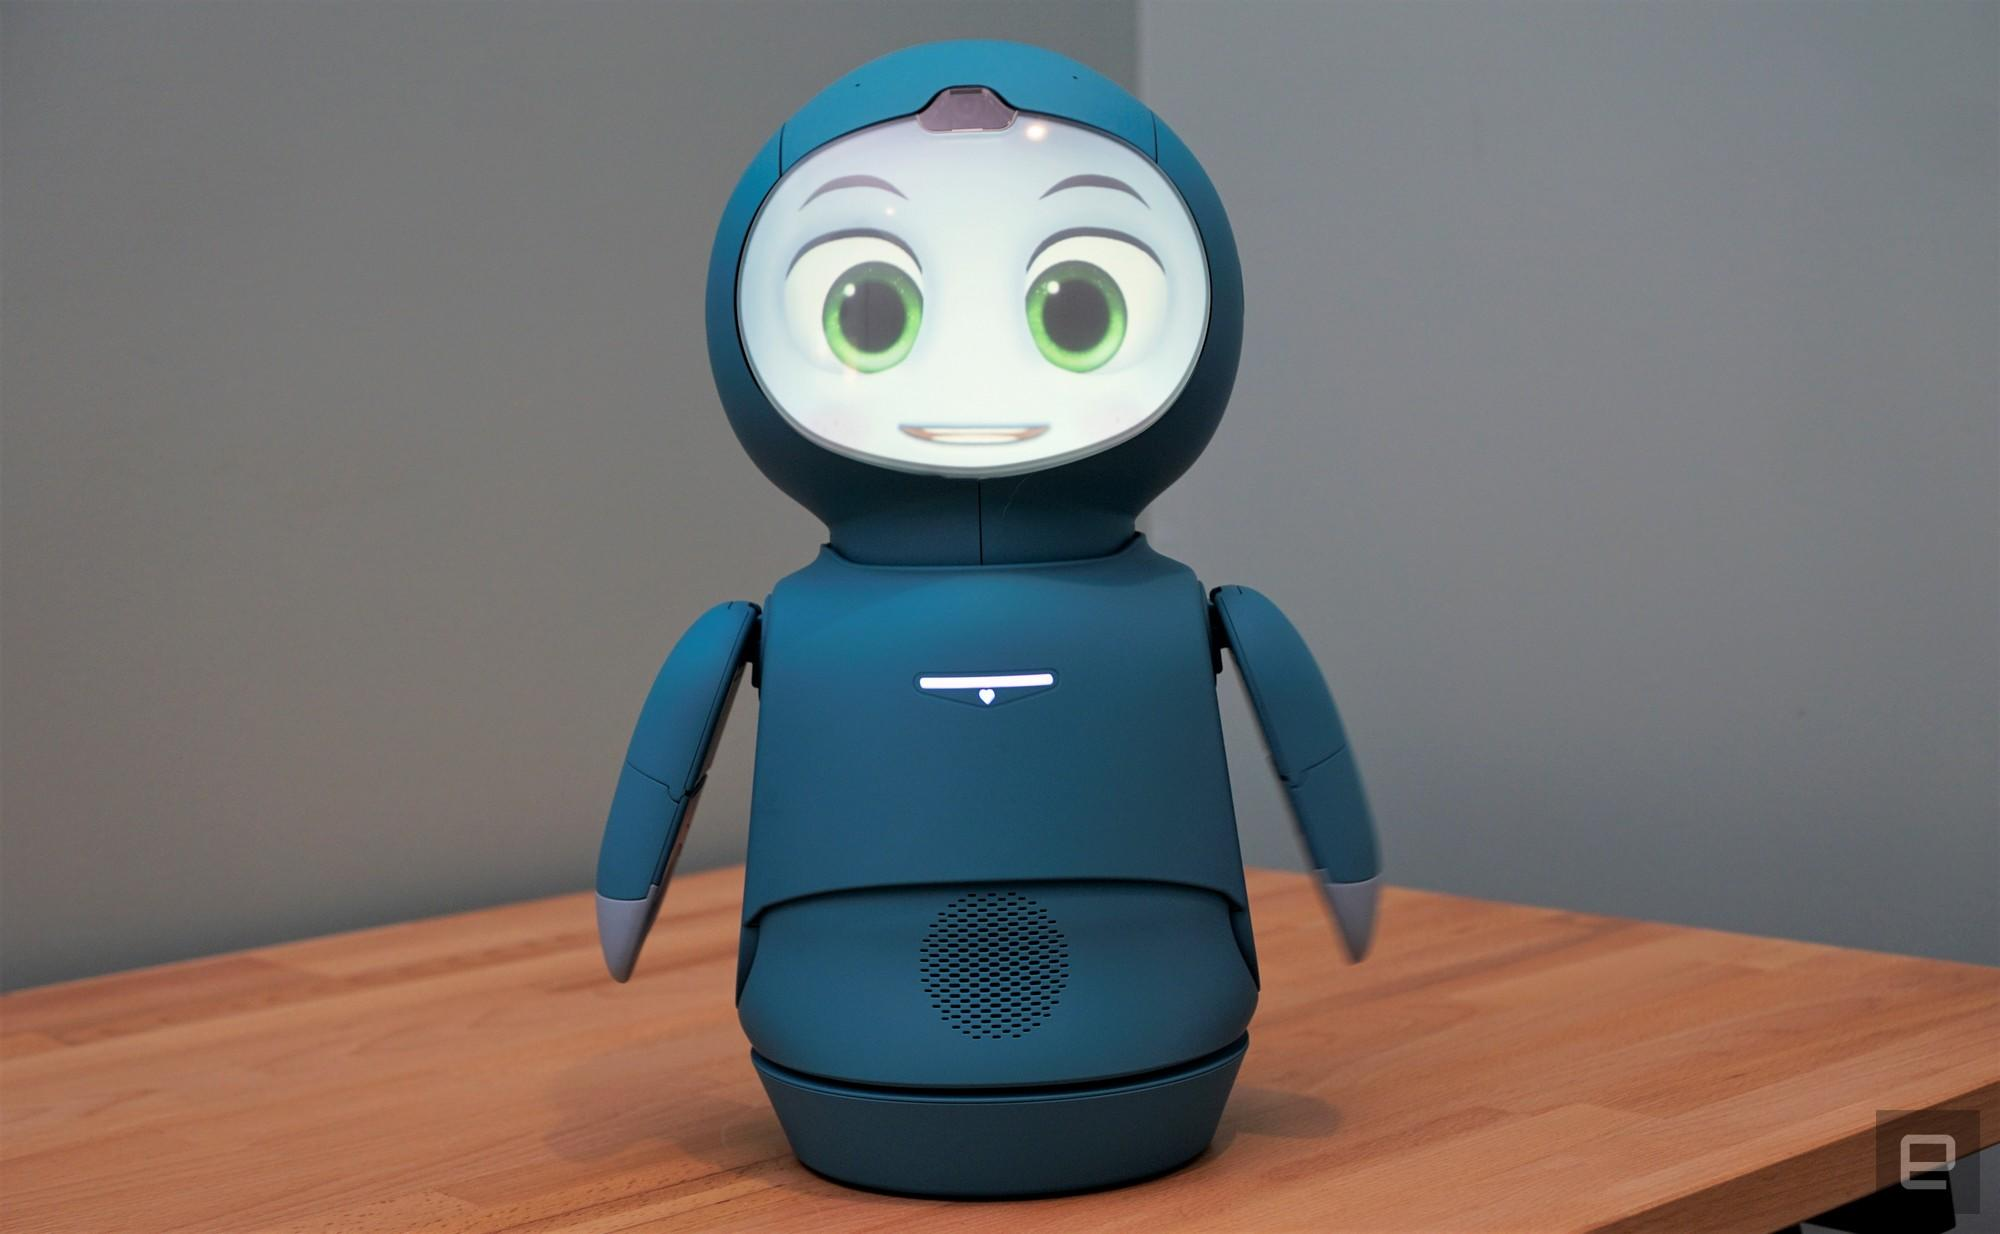 Moxie Embodied Robot